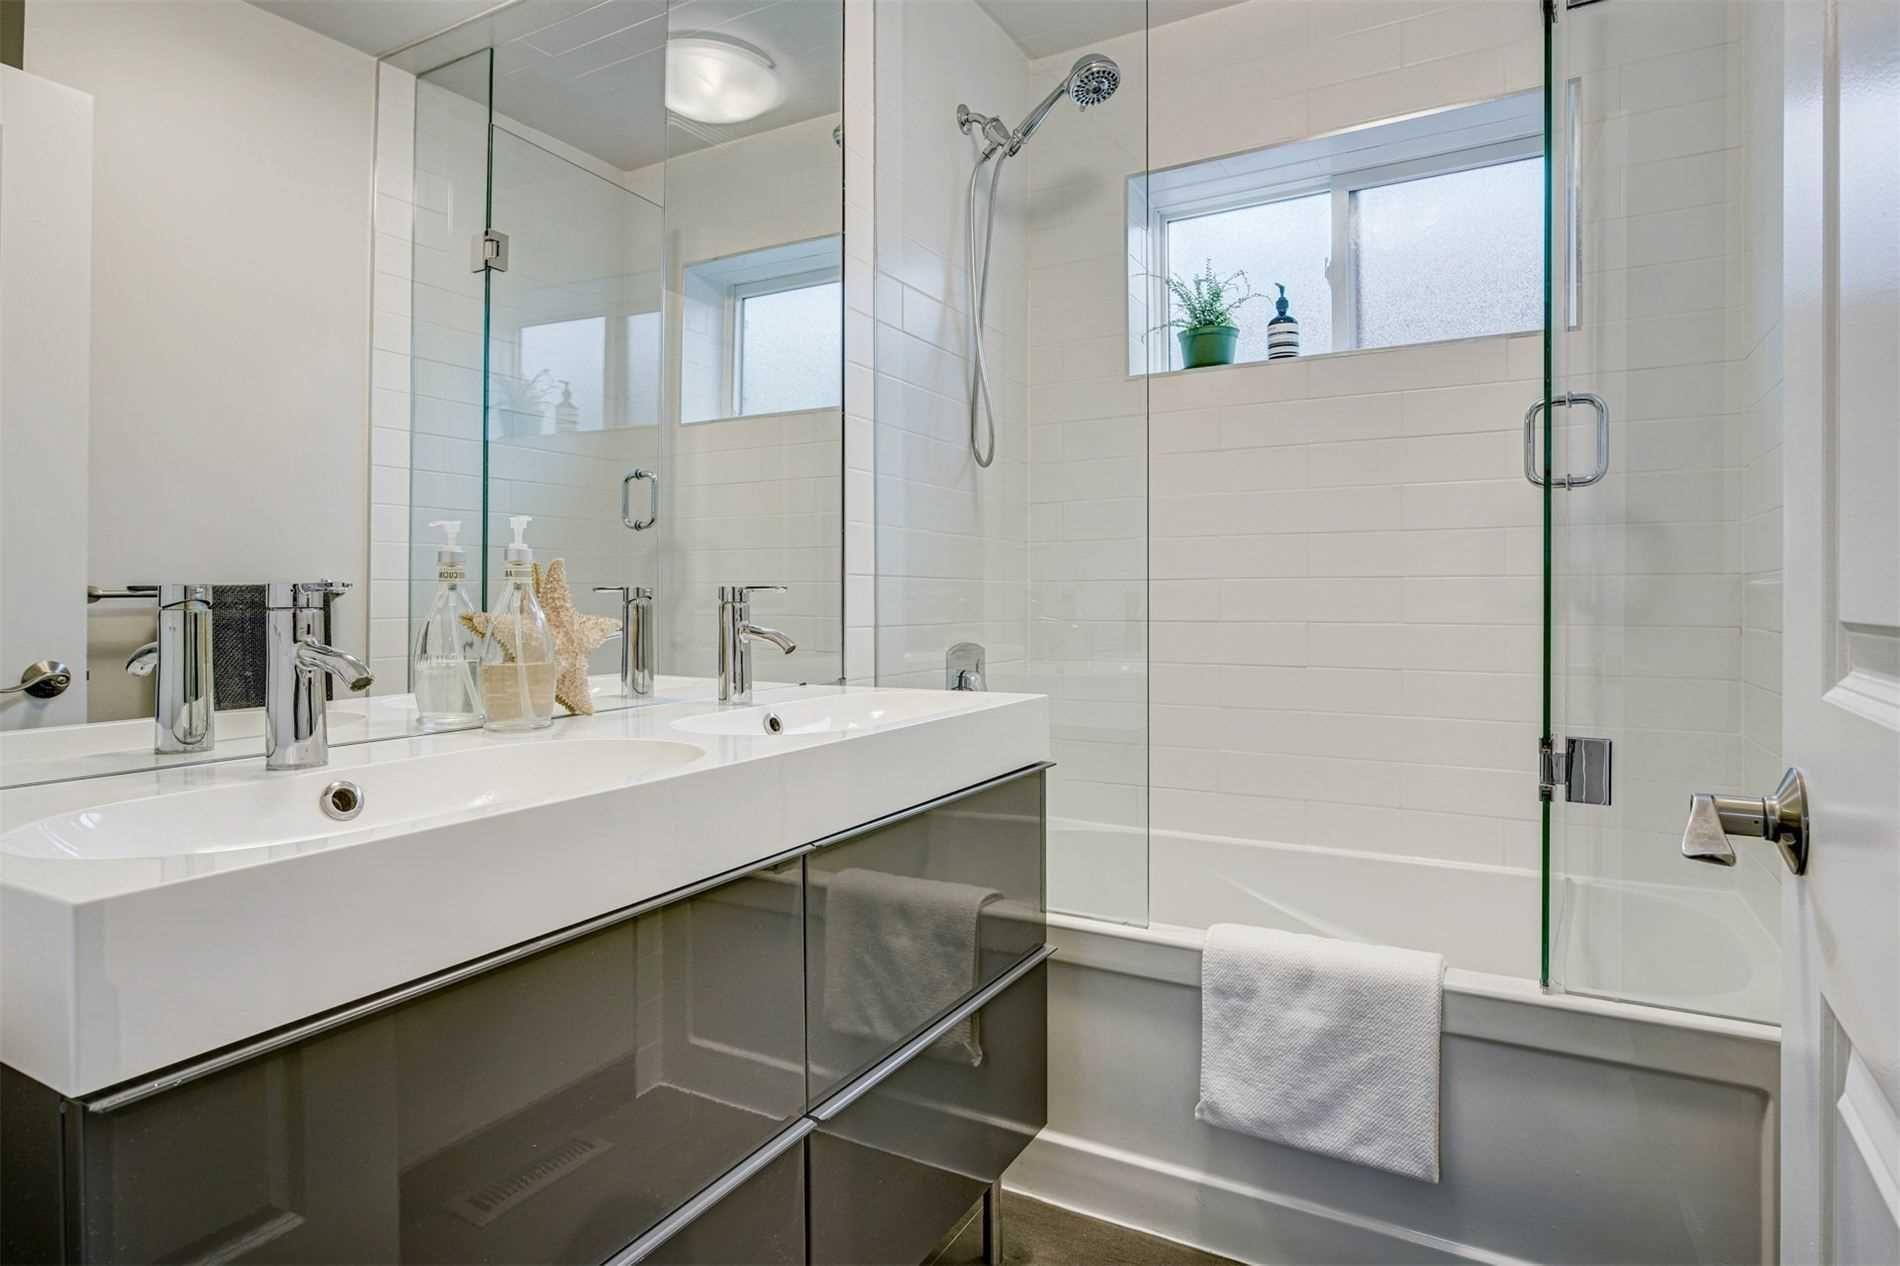 Photo 21: Photos: 92 Holborne Avenue in Toronto: Danforth Village-East York House (2-Storey) for sale (Toronto E03)  : MLS®# E5204452